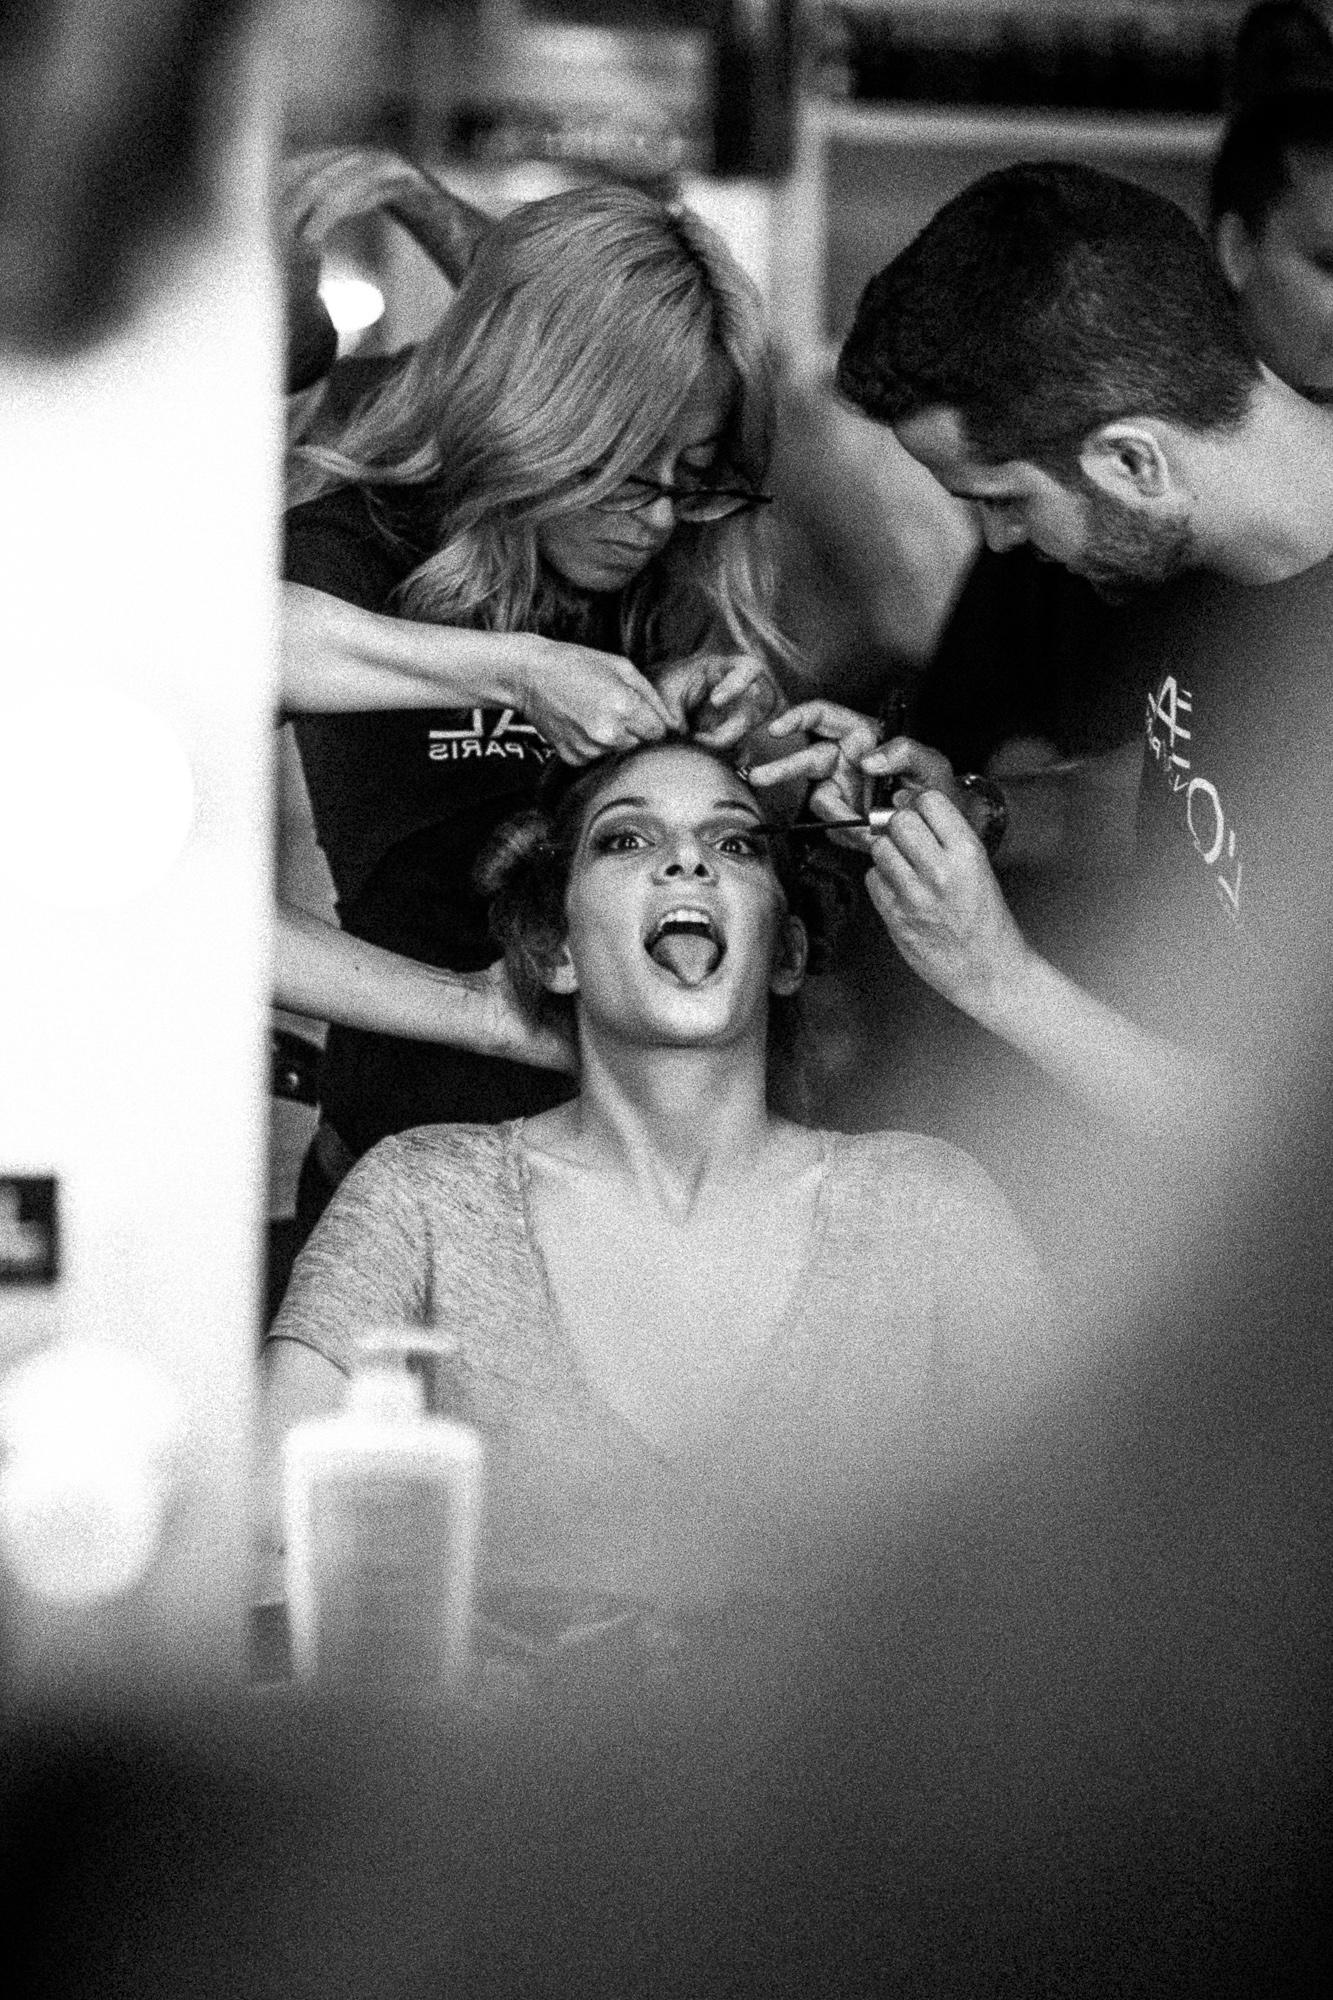 oscar-arribas-beauty-backstage-madrid-fashion-week-cibeles-photography-moda-desfile-fotografo-photographer-portrait-retrato-30__MG_5417.jpg